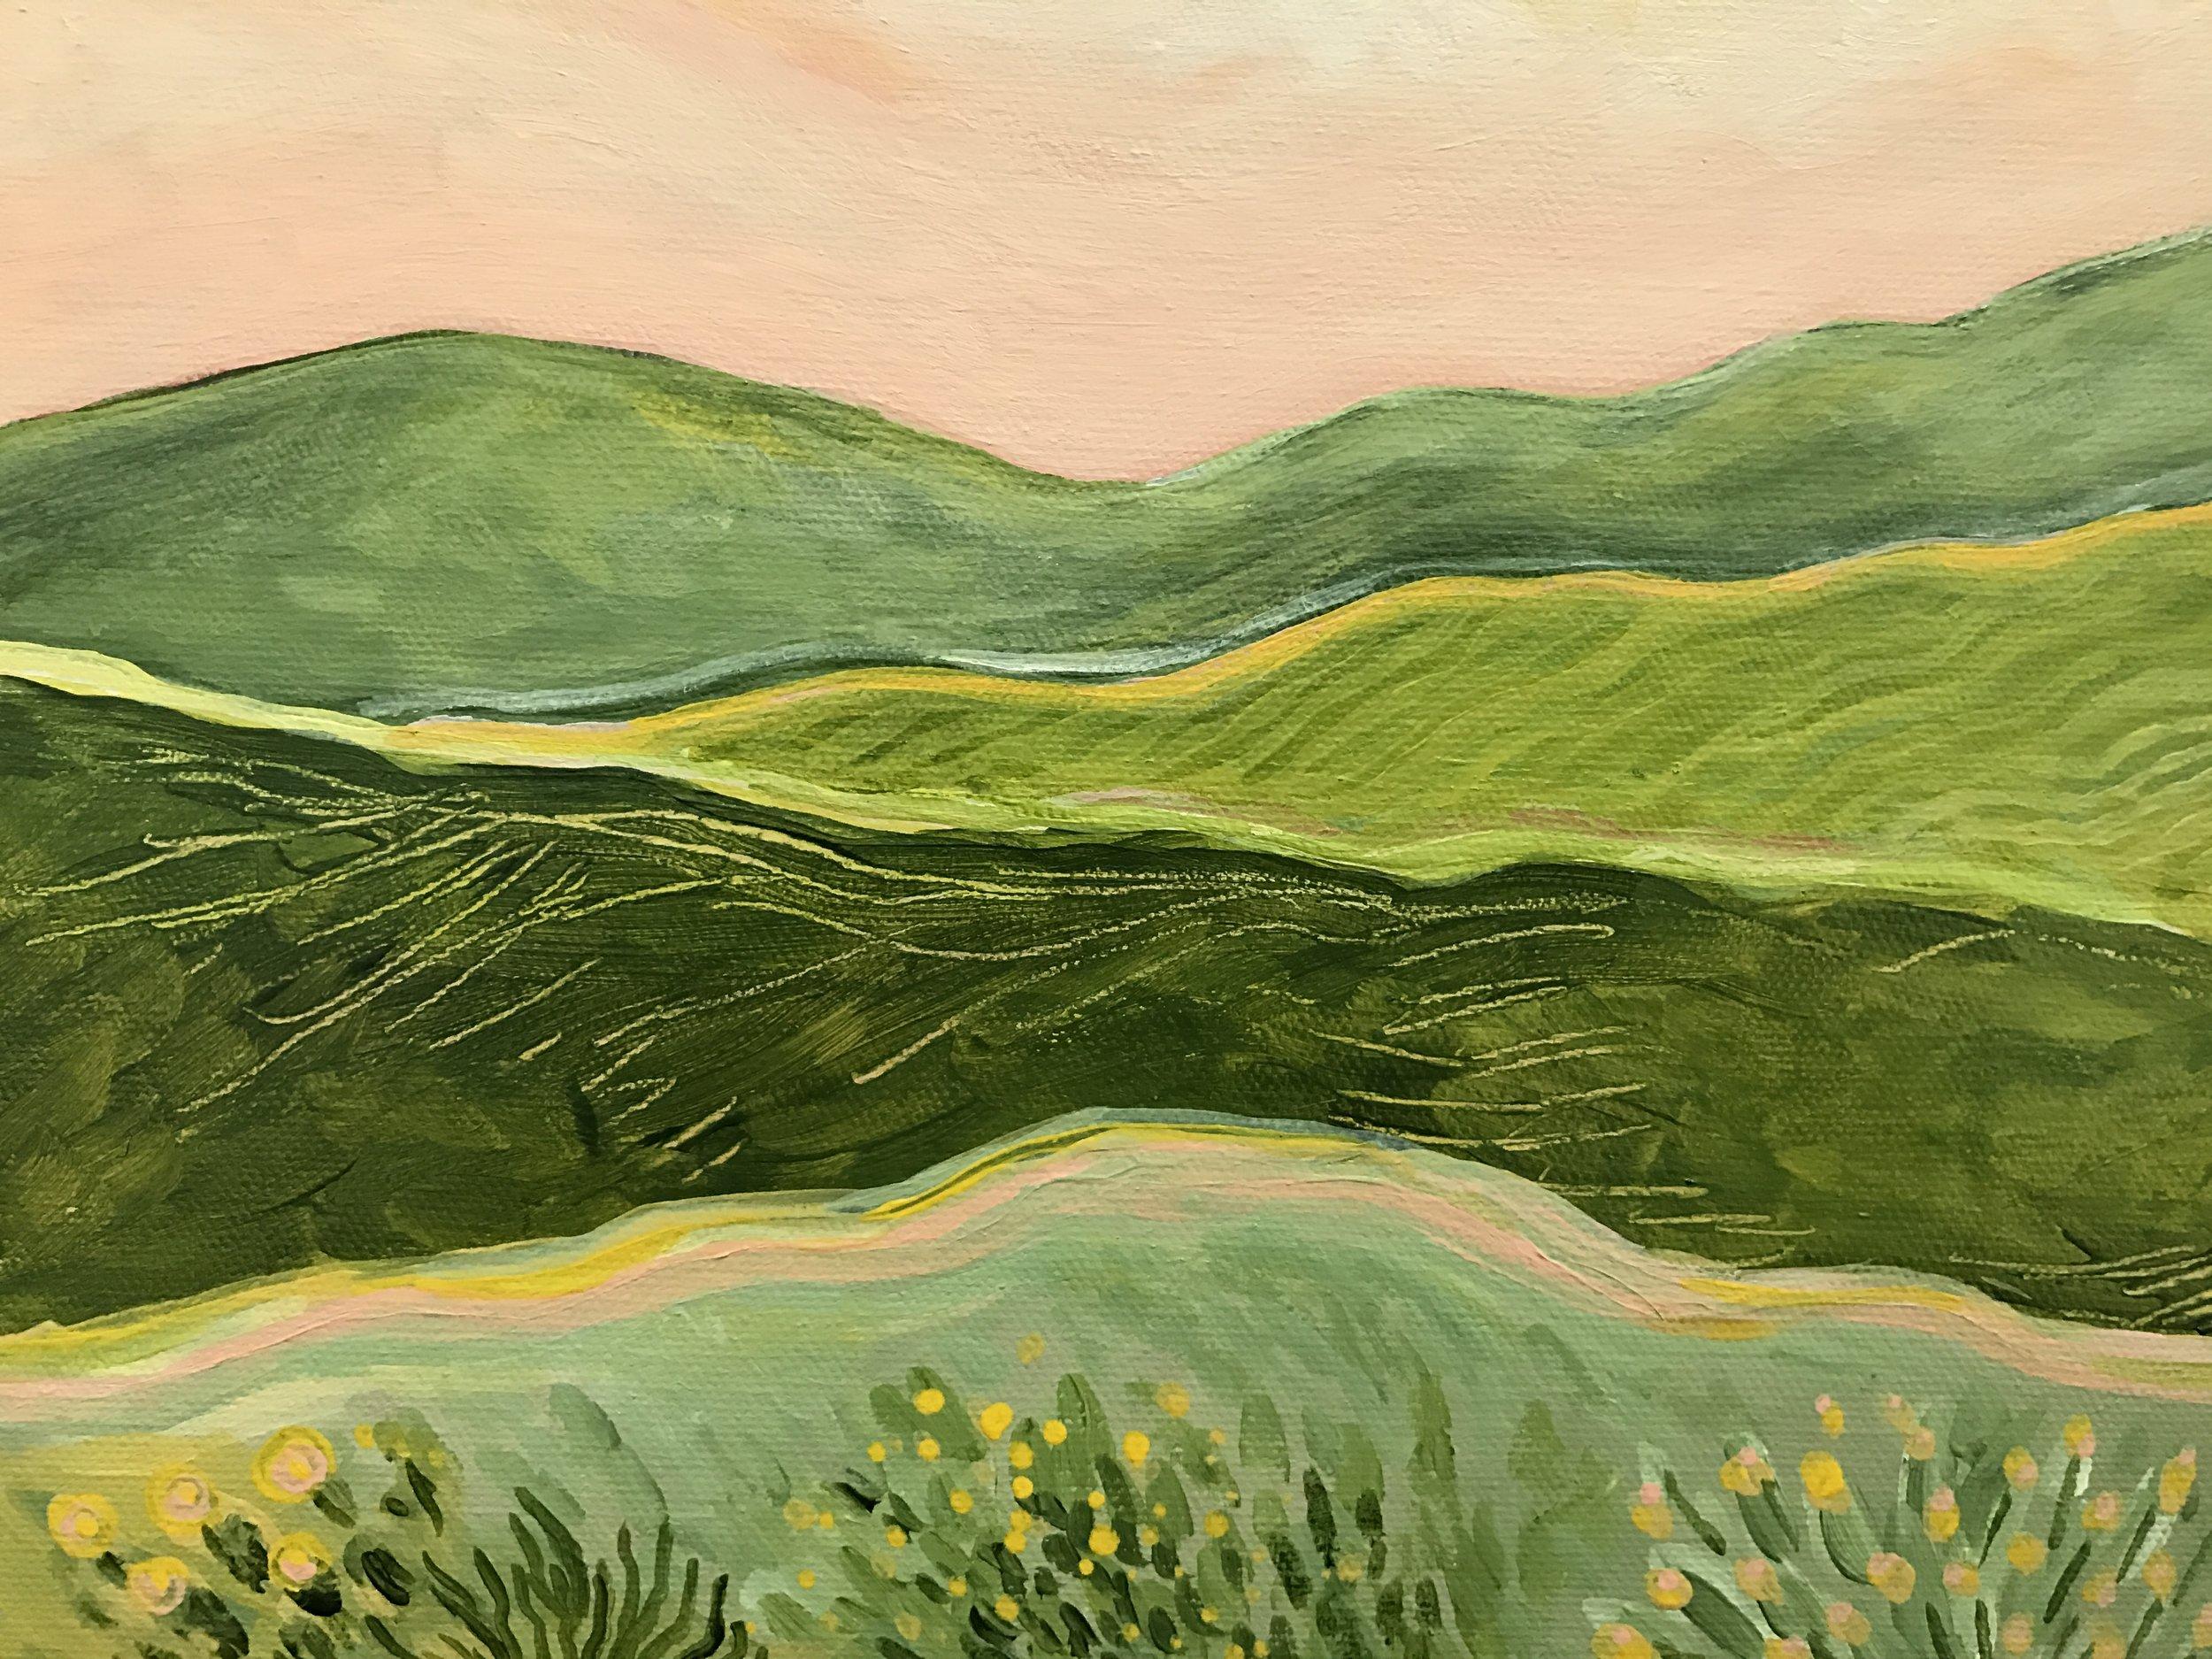 allison-haley-Marin-hills-painting.JPG